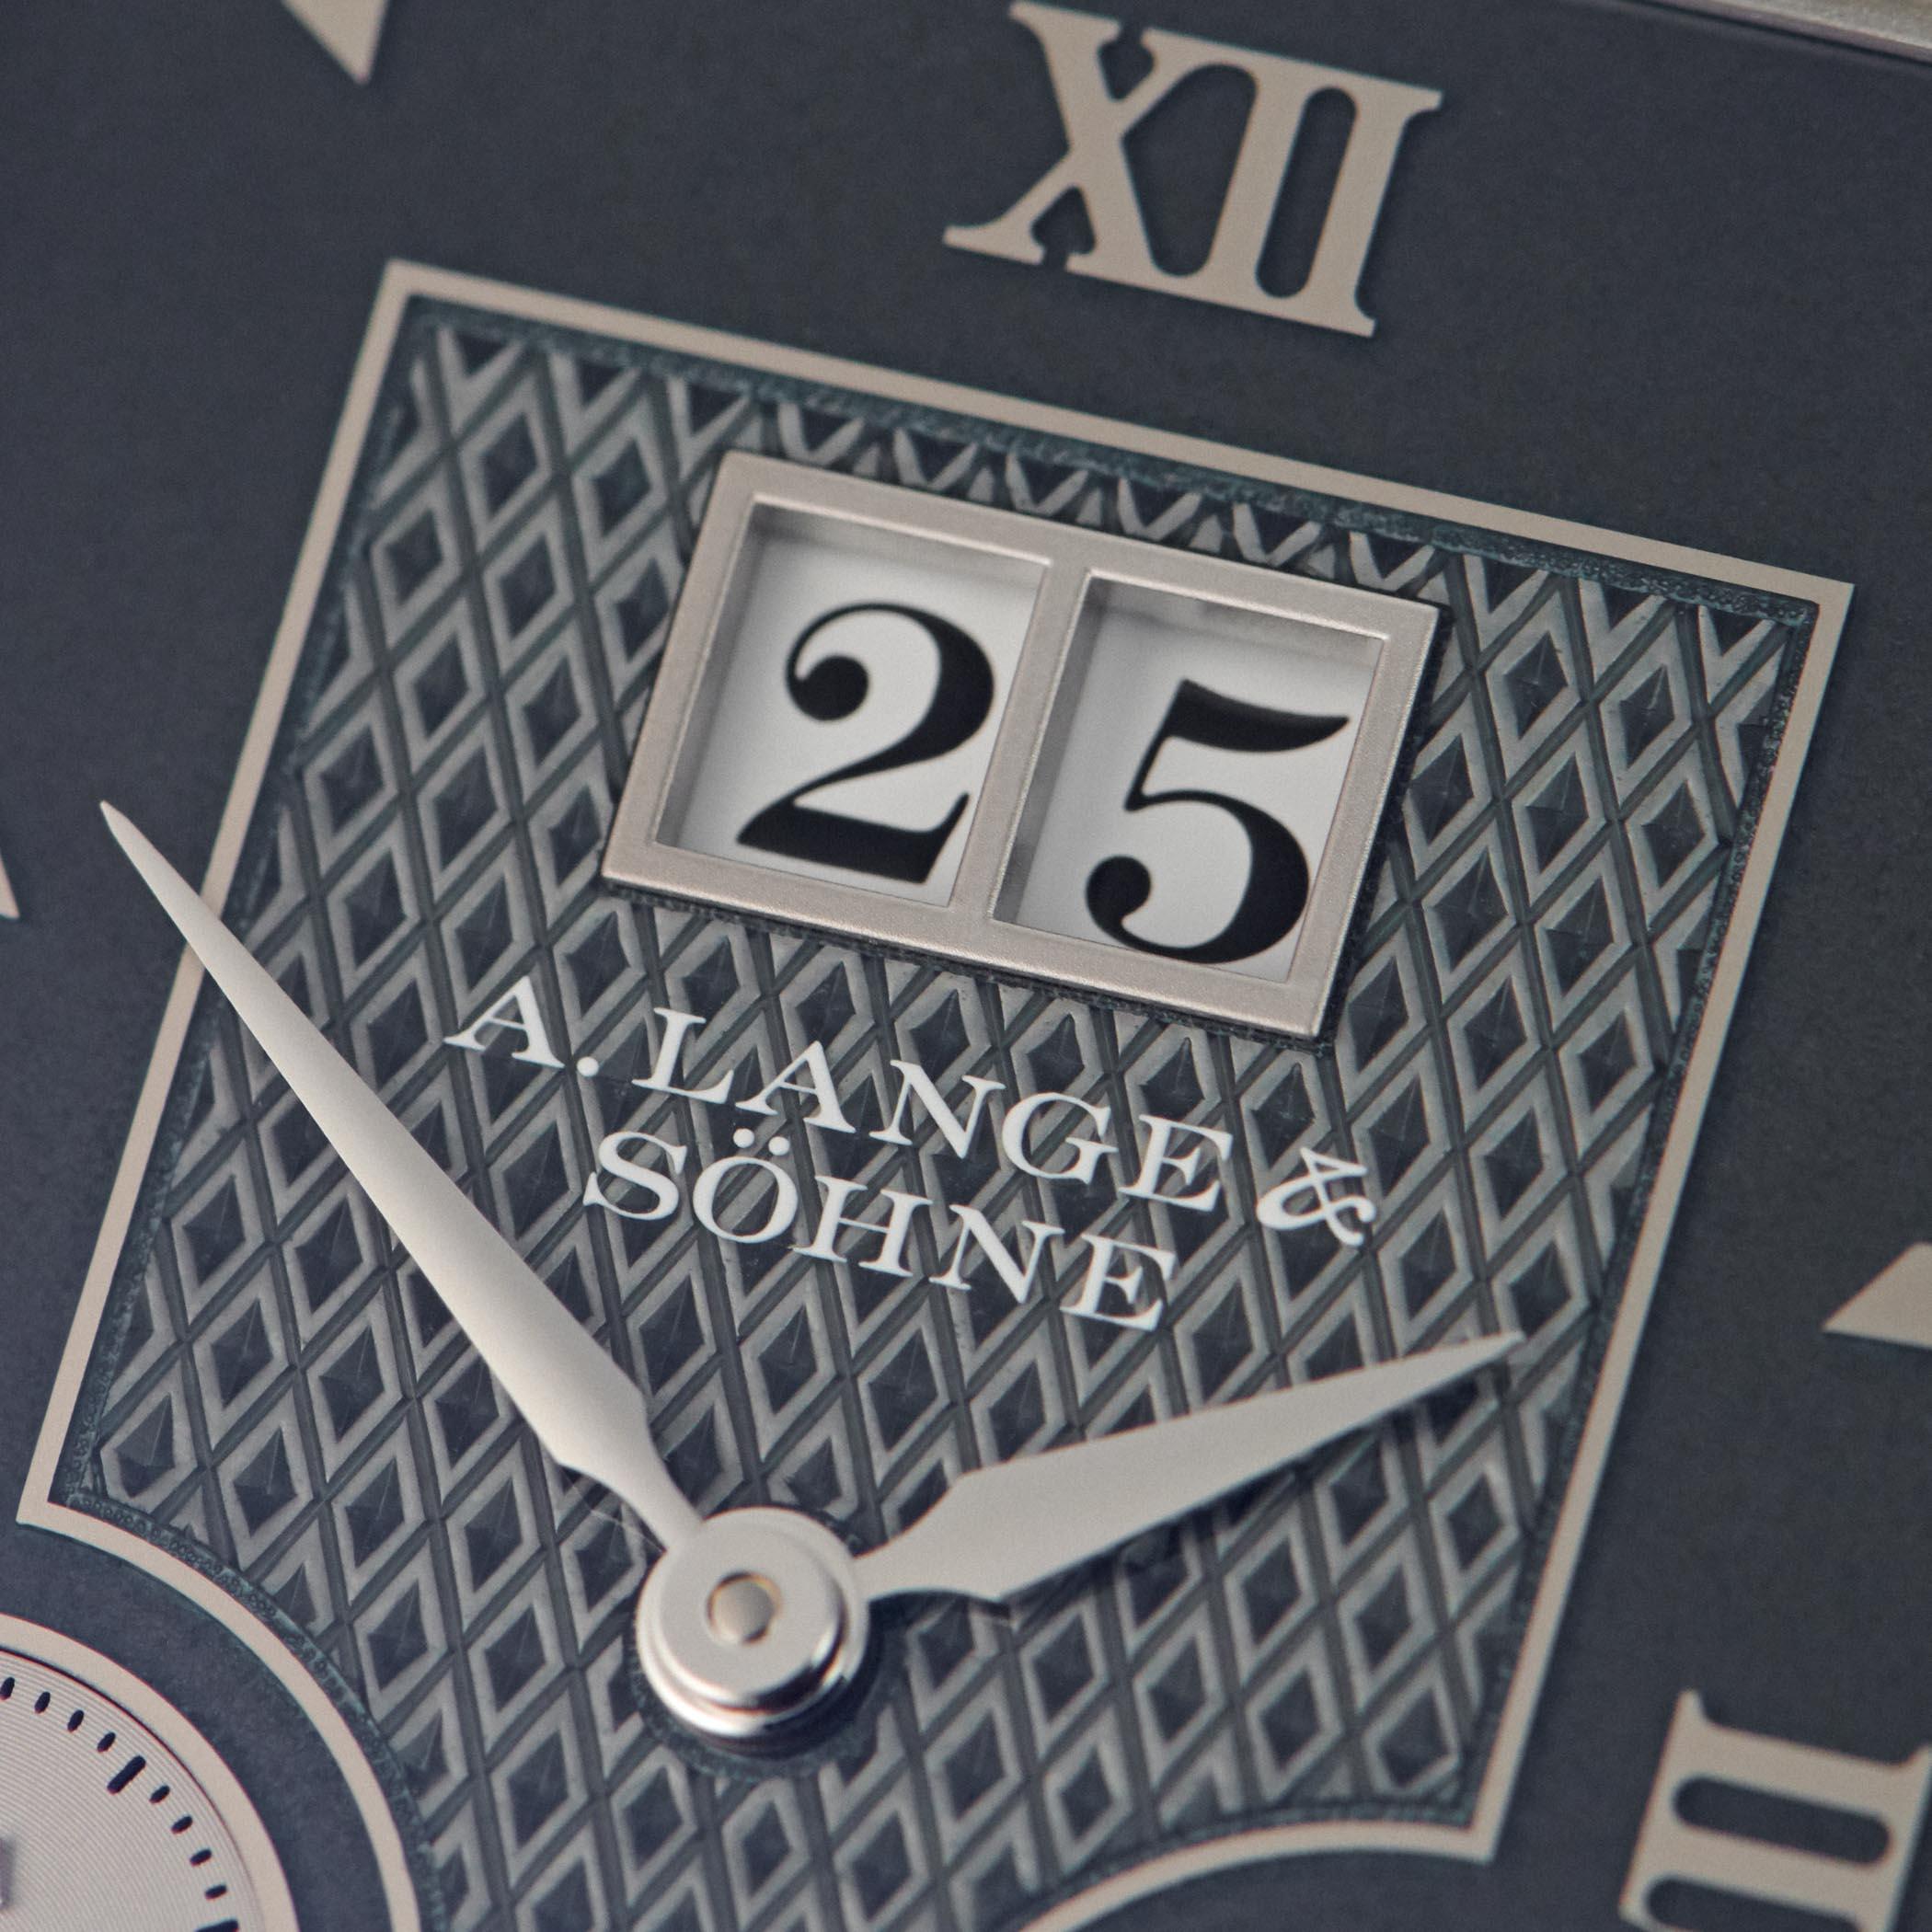 2021 A. Lange & Söhne Cabaret Tourbillon Handwerkskunst